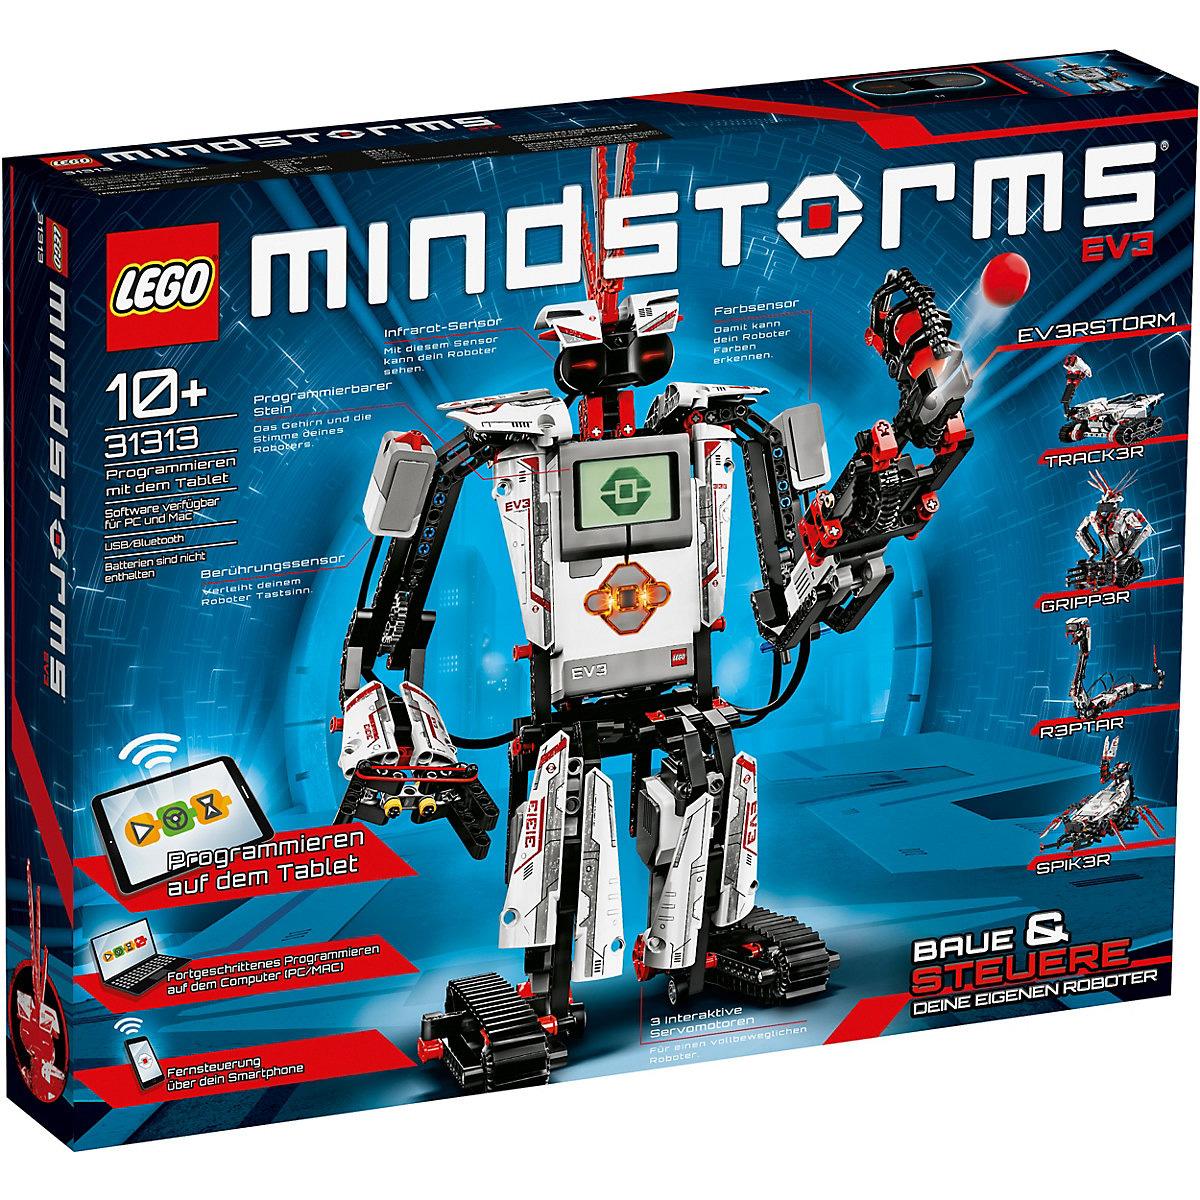 لگو سری Mindstorms مدل 31313